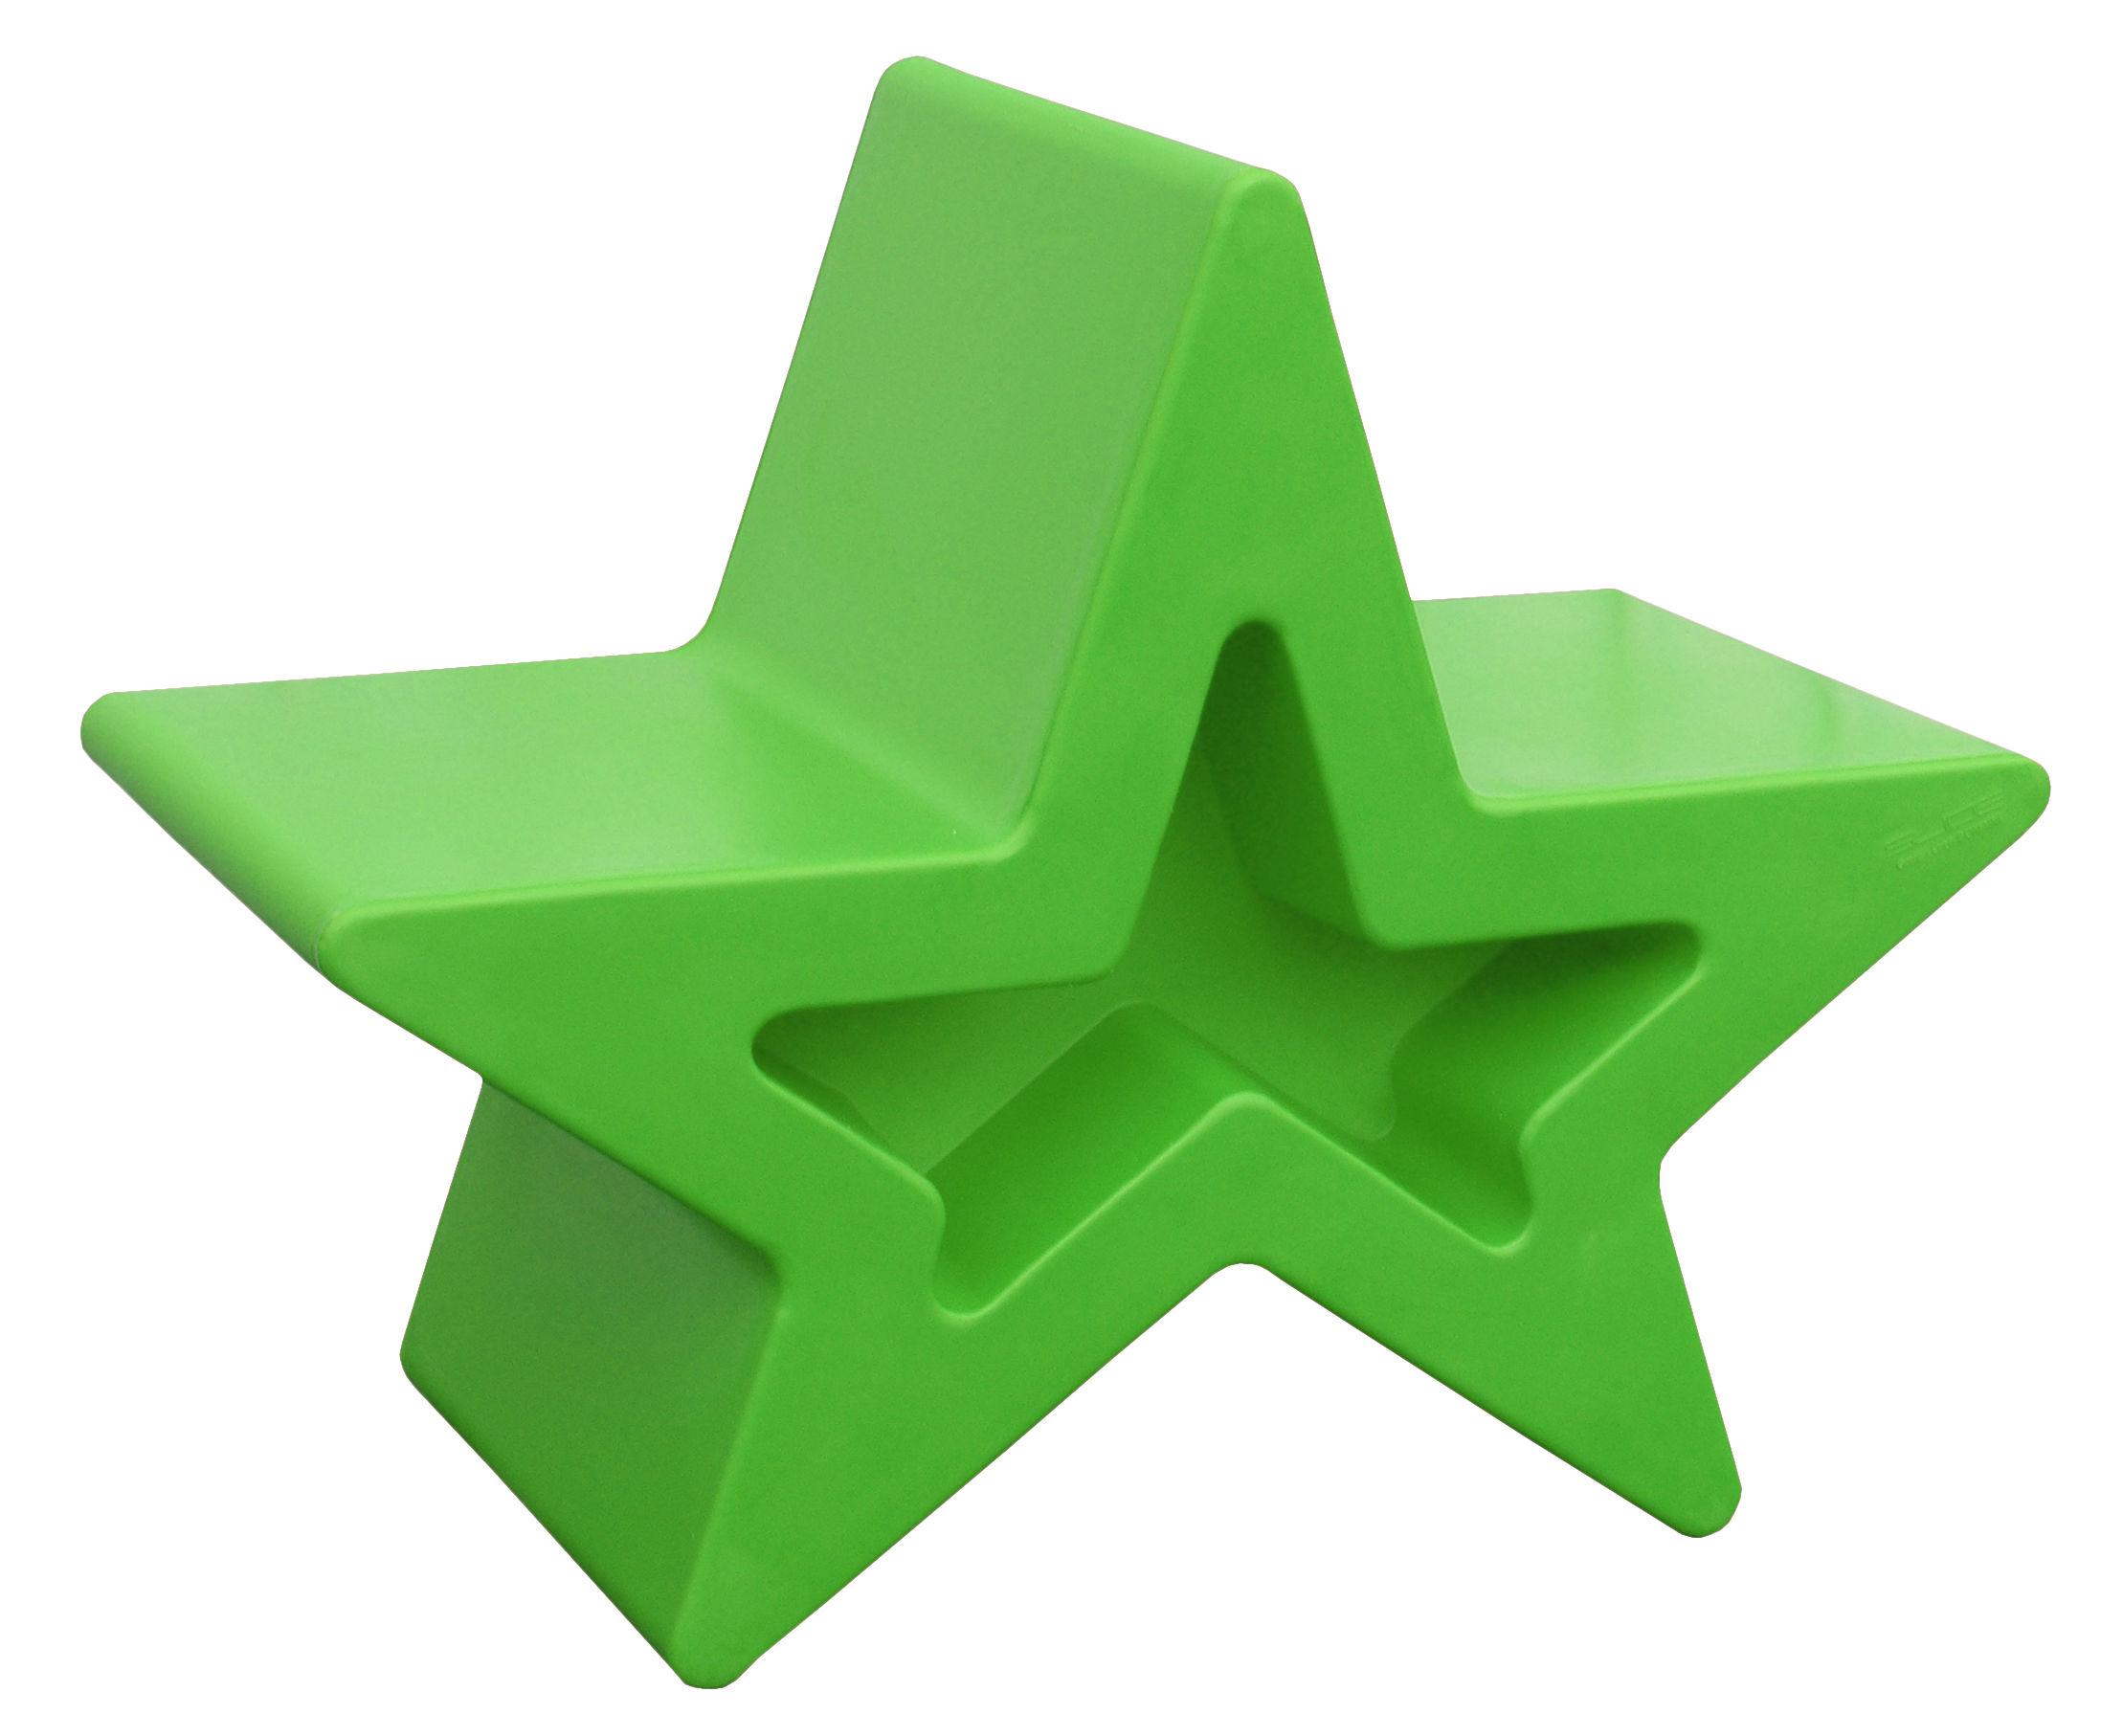 Tabouret bas Astra fauteuil - Slide - Vert - Polyéthylène